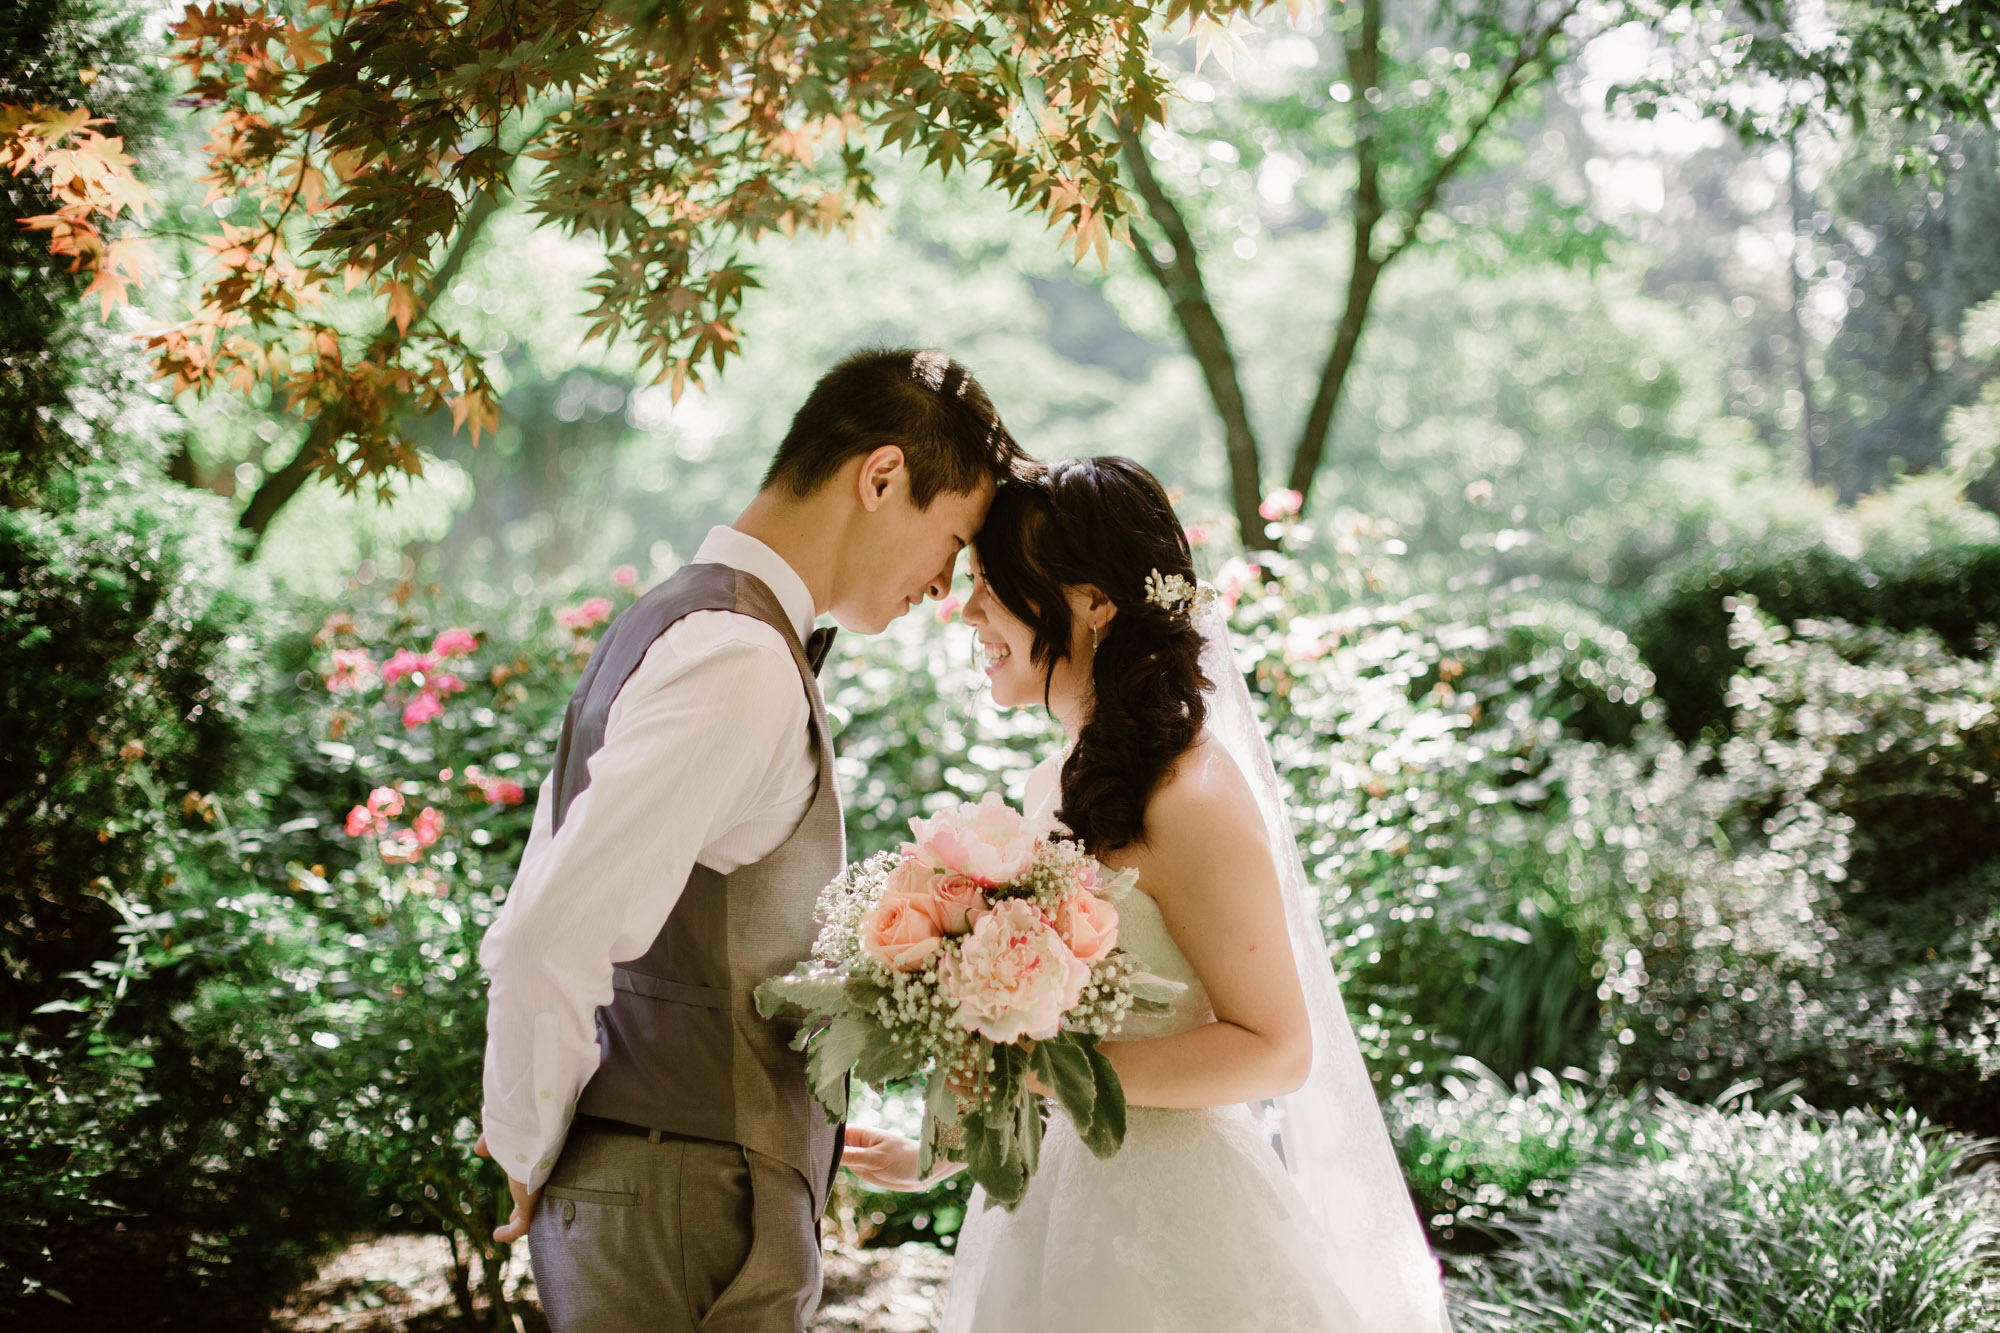 SarahMattozziPhotography-KingsCharter-Wedding-18.jpg